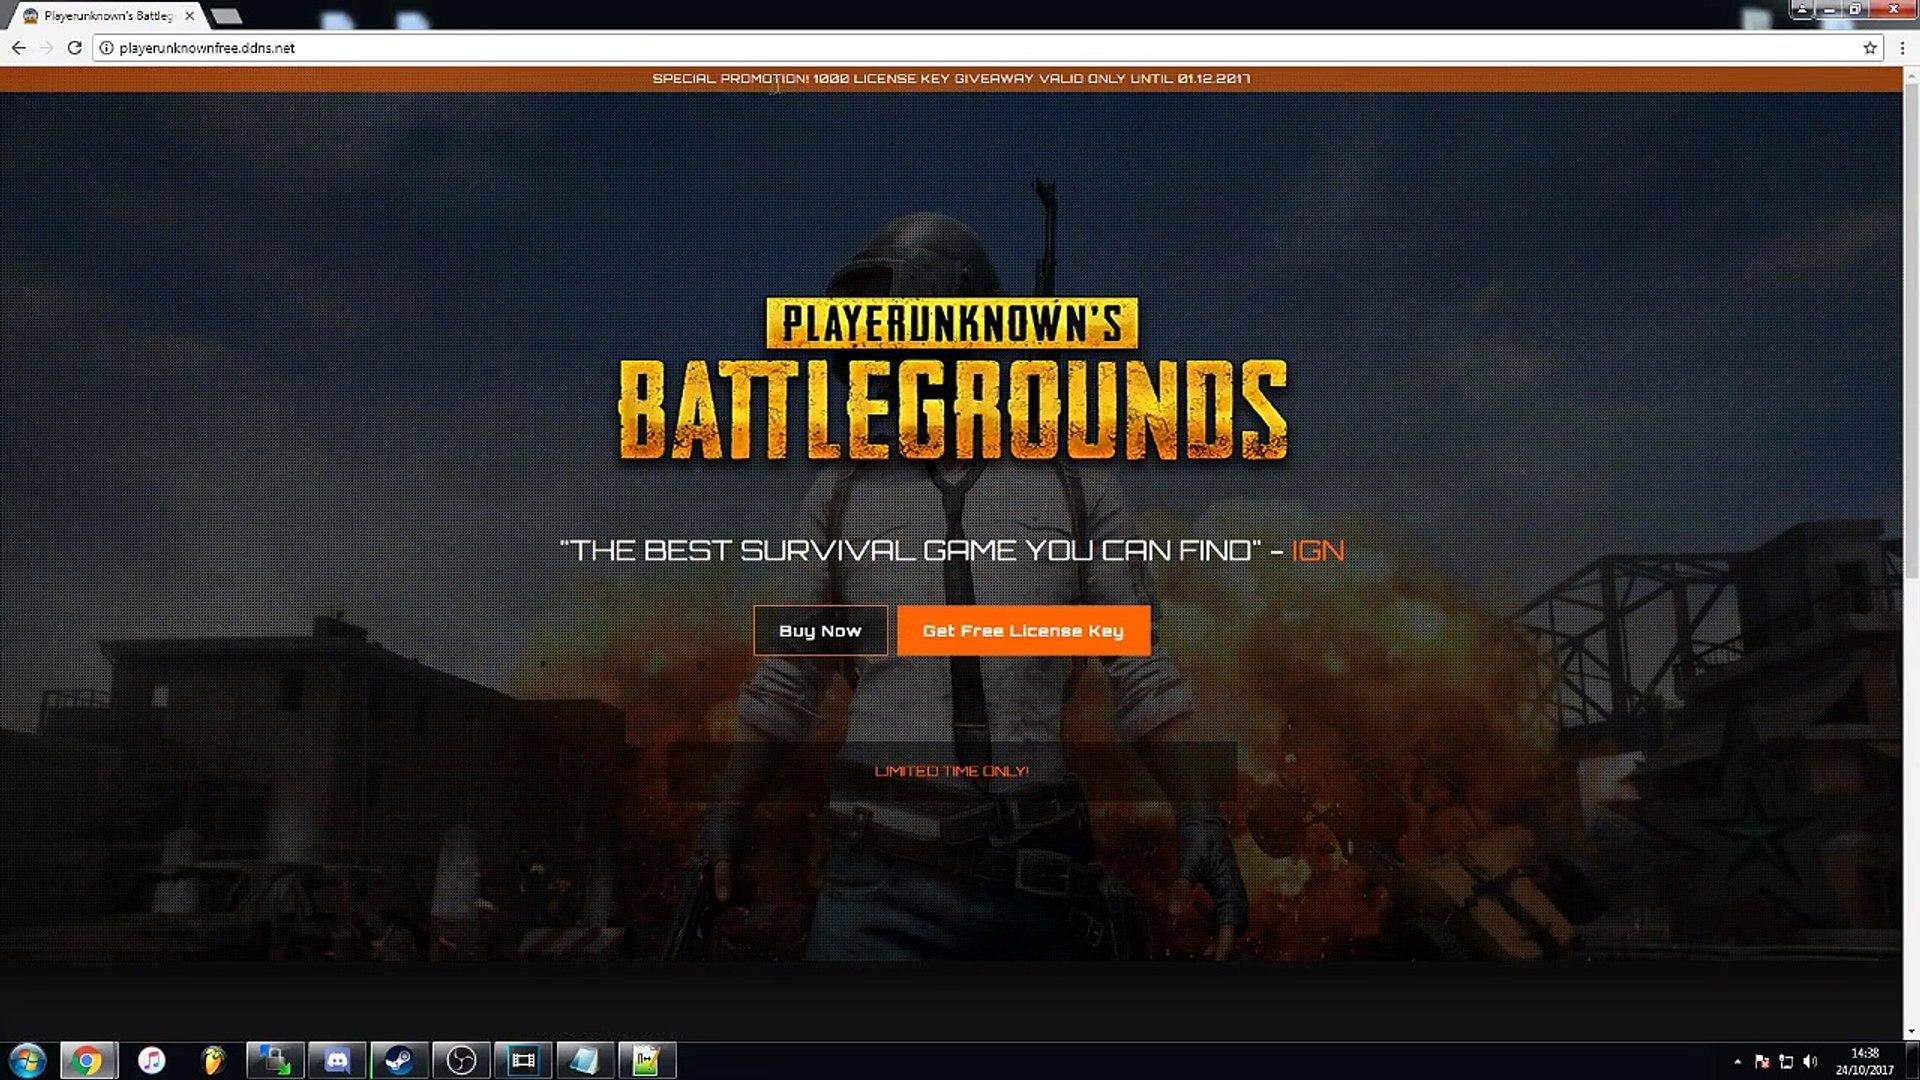 PLAYERUNKNOWN BATTLESGROUND Free Steam Key [VOICE] [PROOF] - PUBG For Free  No Crack [WORKING OCT 17]